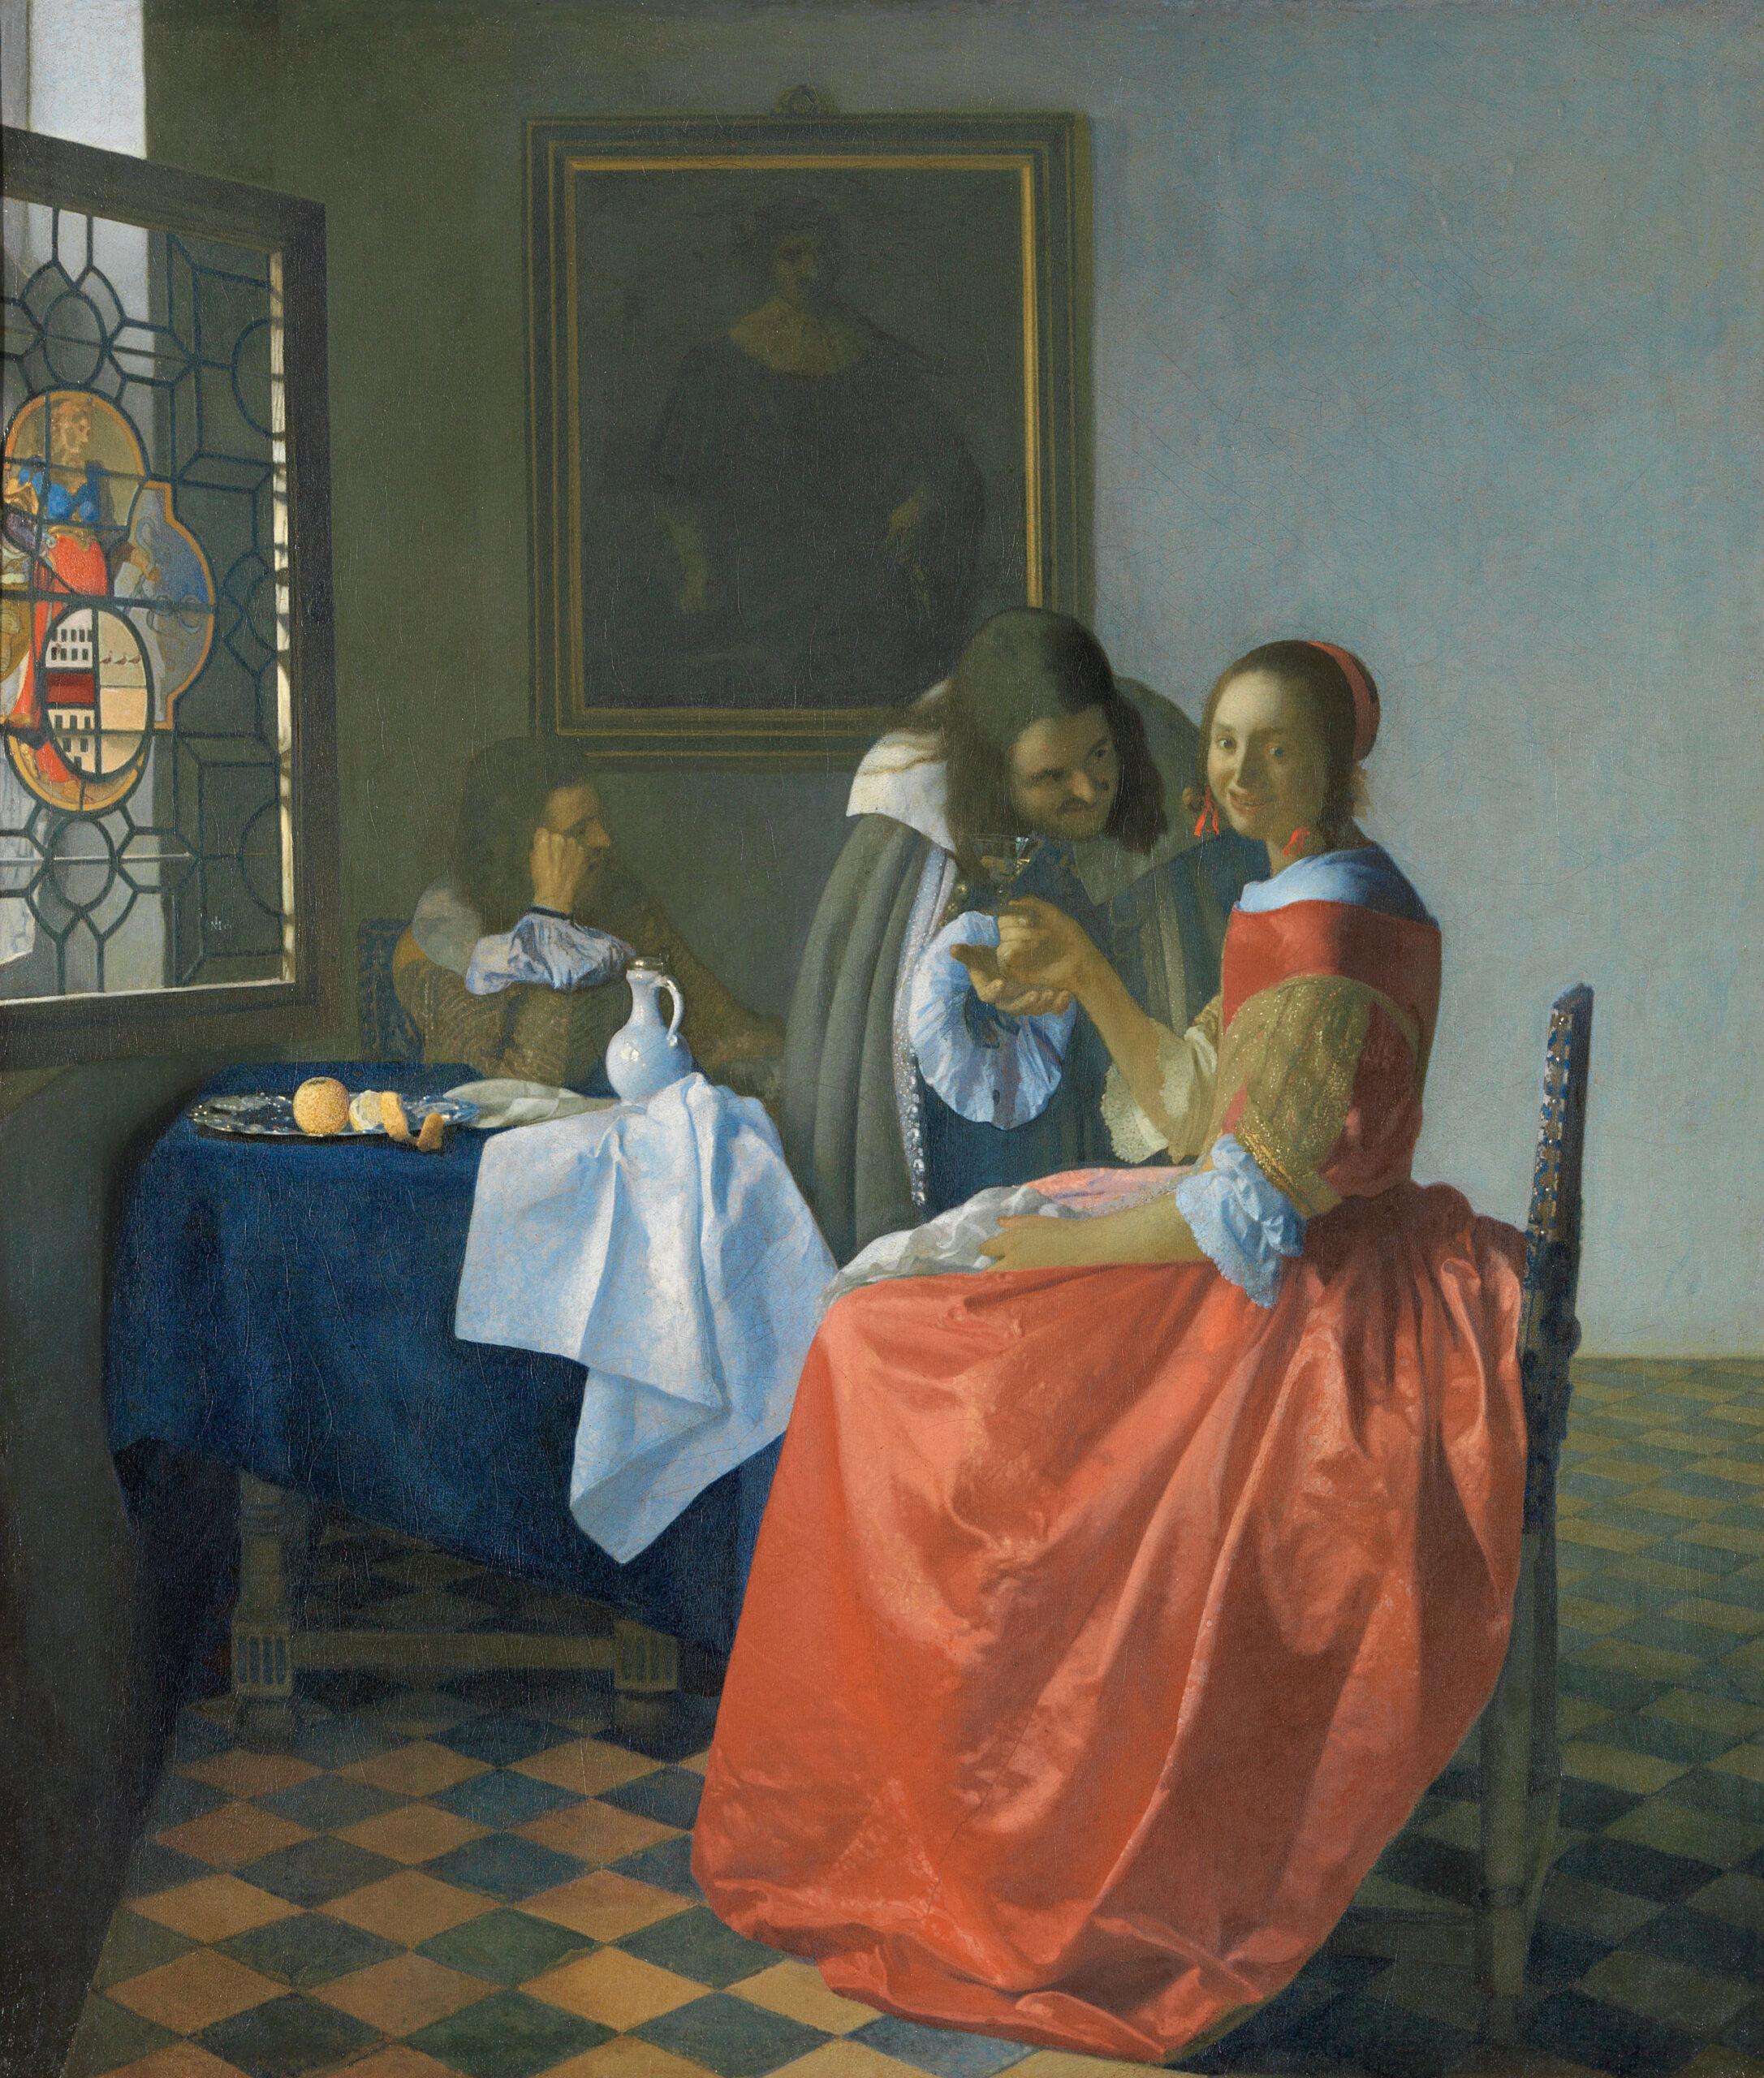 Fig. 10. Johannes Vermeer (1632-1675), Girl with a Wineglass, ca. 1658-60, canvas, 78 x 67 cm Herzog Anton Ulrich-Museum Braunschweig, inv. no. GG 316